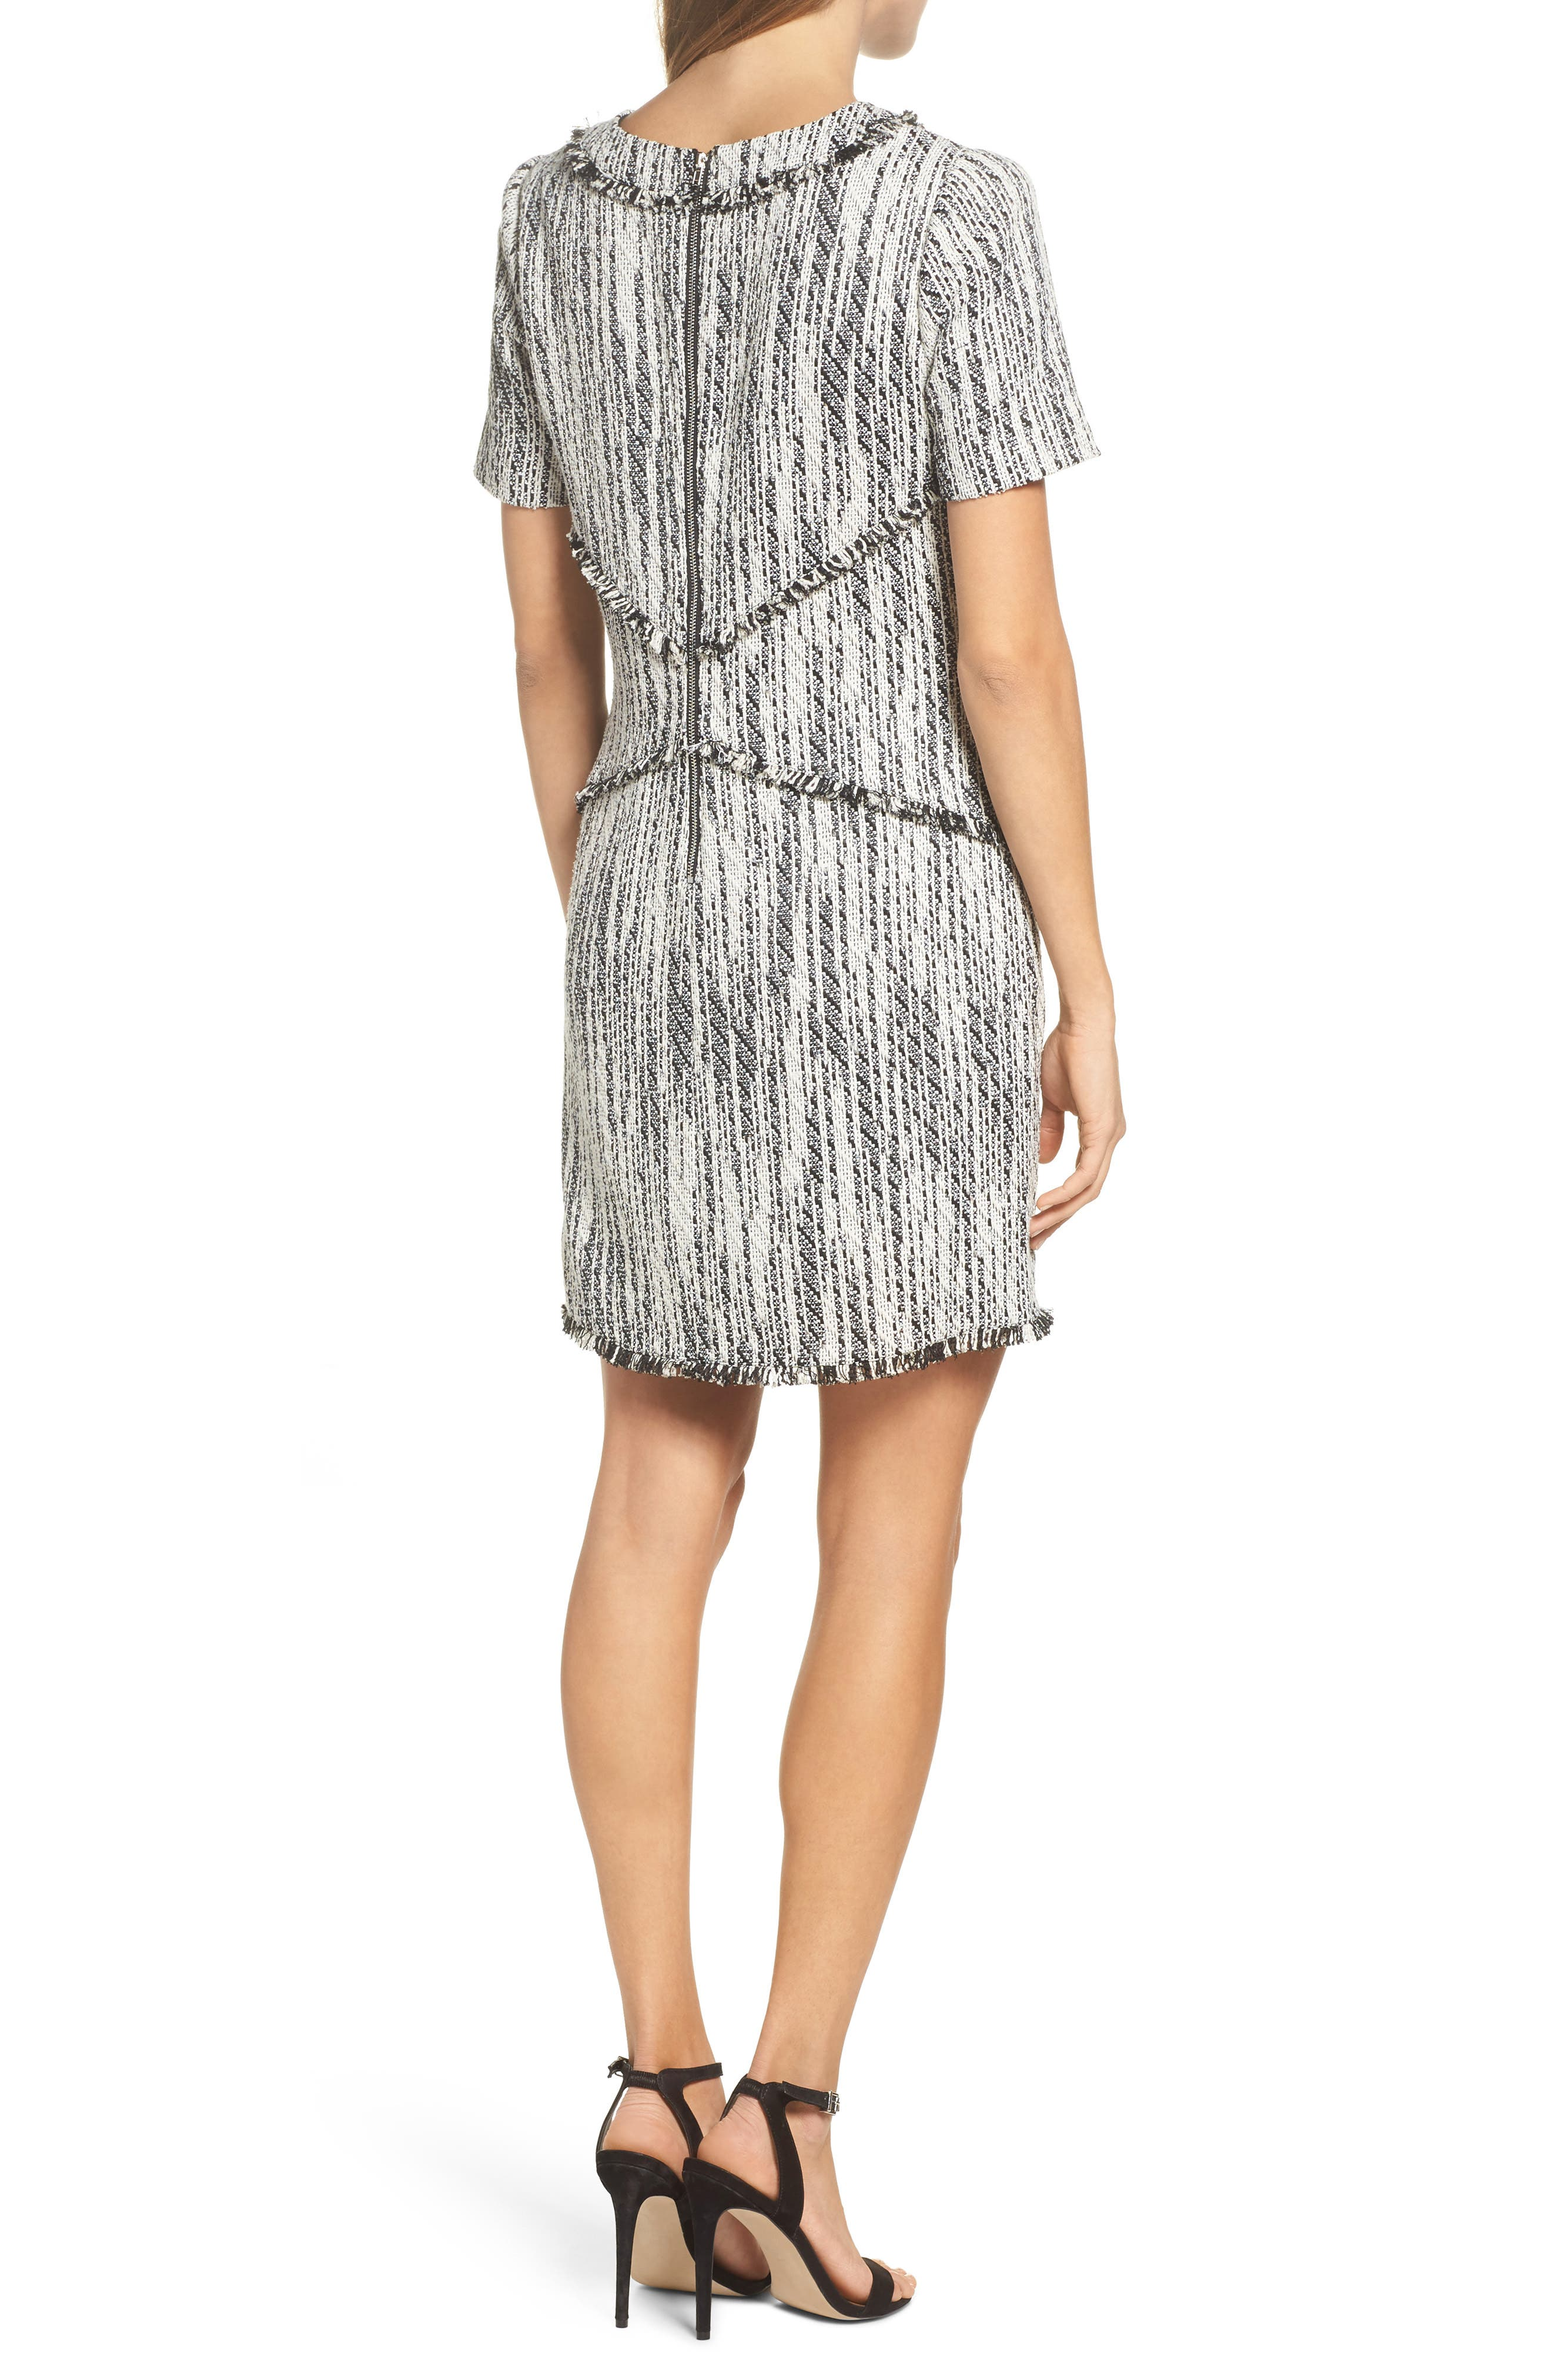 Dolce Vita Tweed Shift Dress,                             Alternate thumbnail 3, color,                             Black/ Ivory Tweed